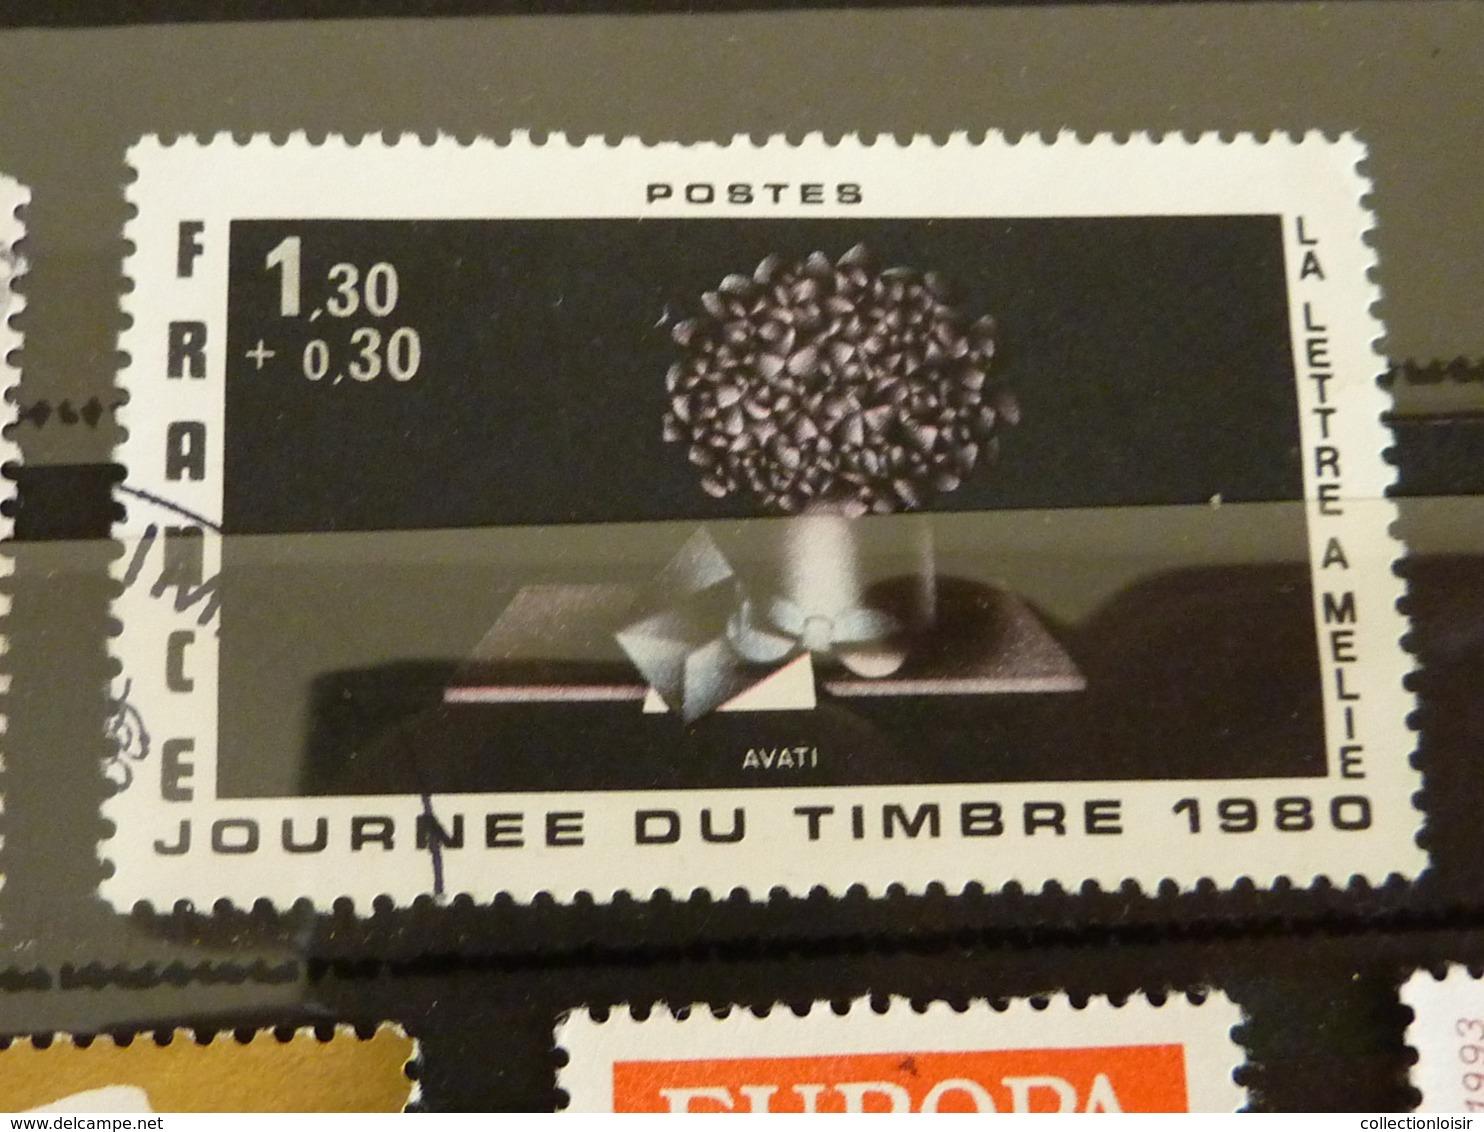 ALBUM CONTENANT 310 TIMBRES DE FRANCE ET DU MONDE ( 51 Photos ) - Timbres